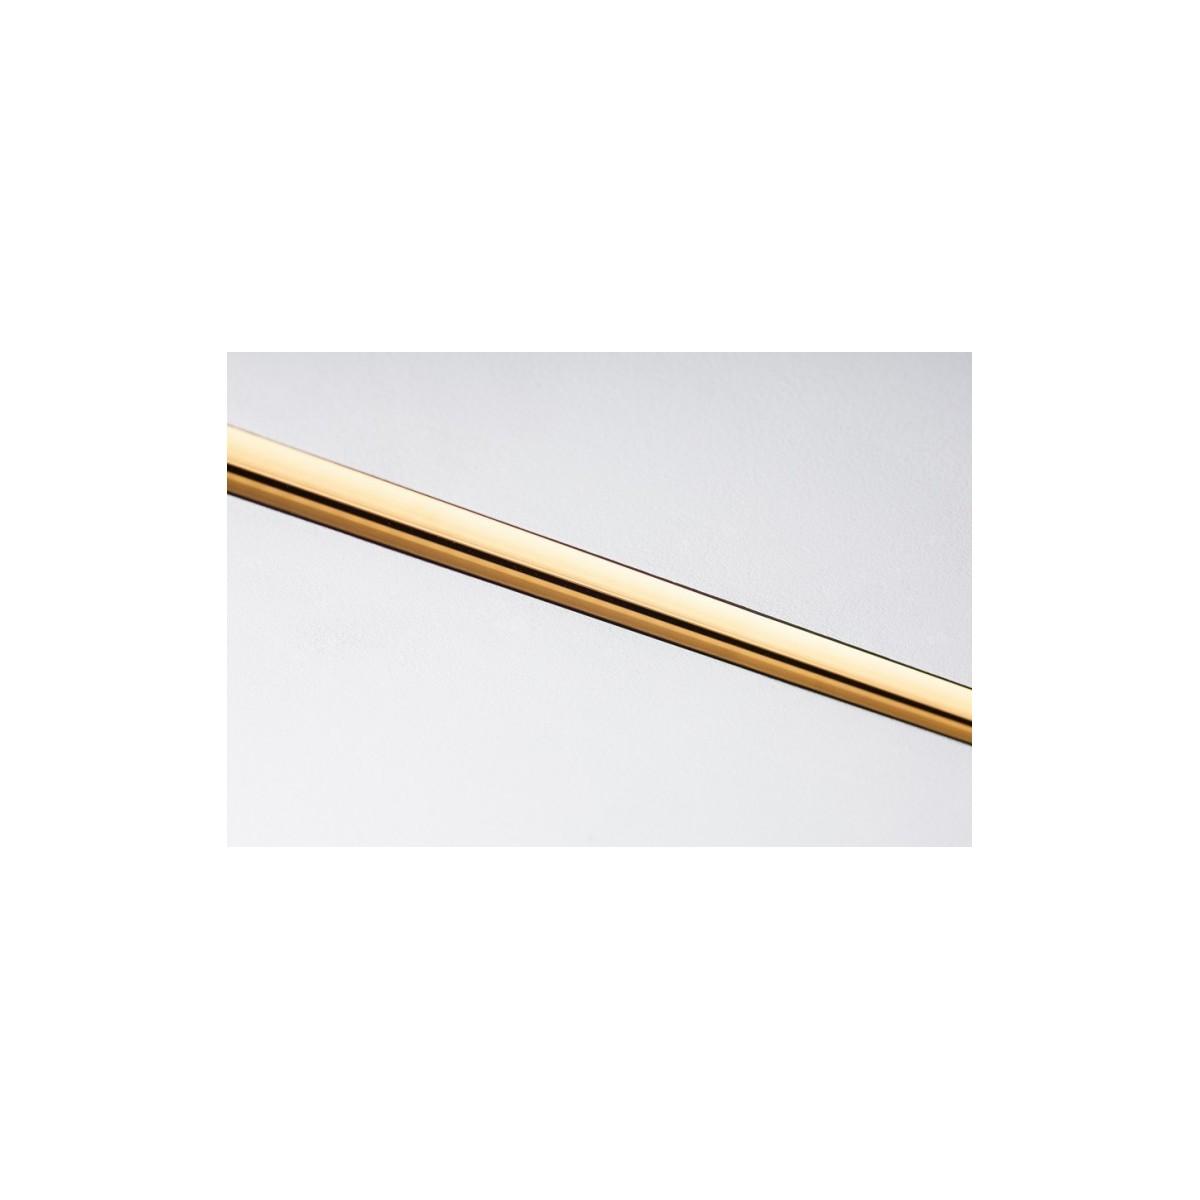 Labra RAY WP.574mm 23W High Power 6-0635 Wpust